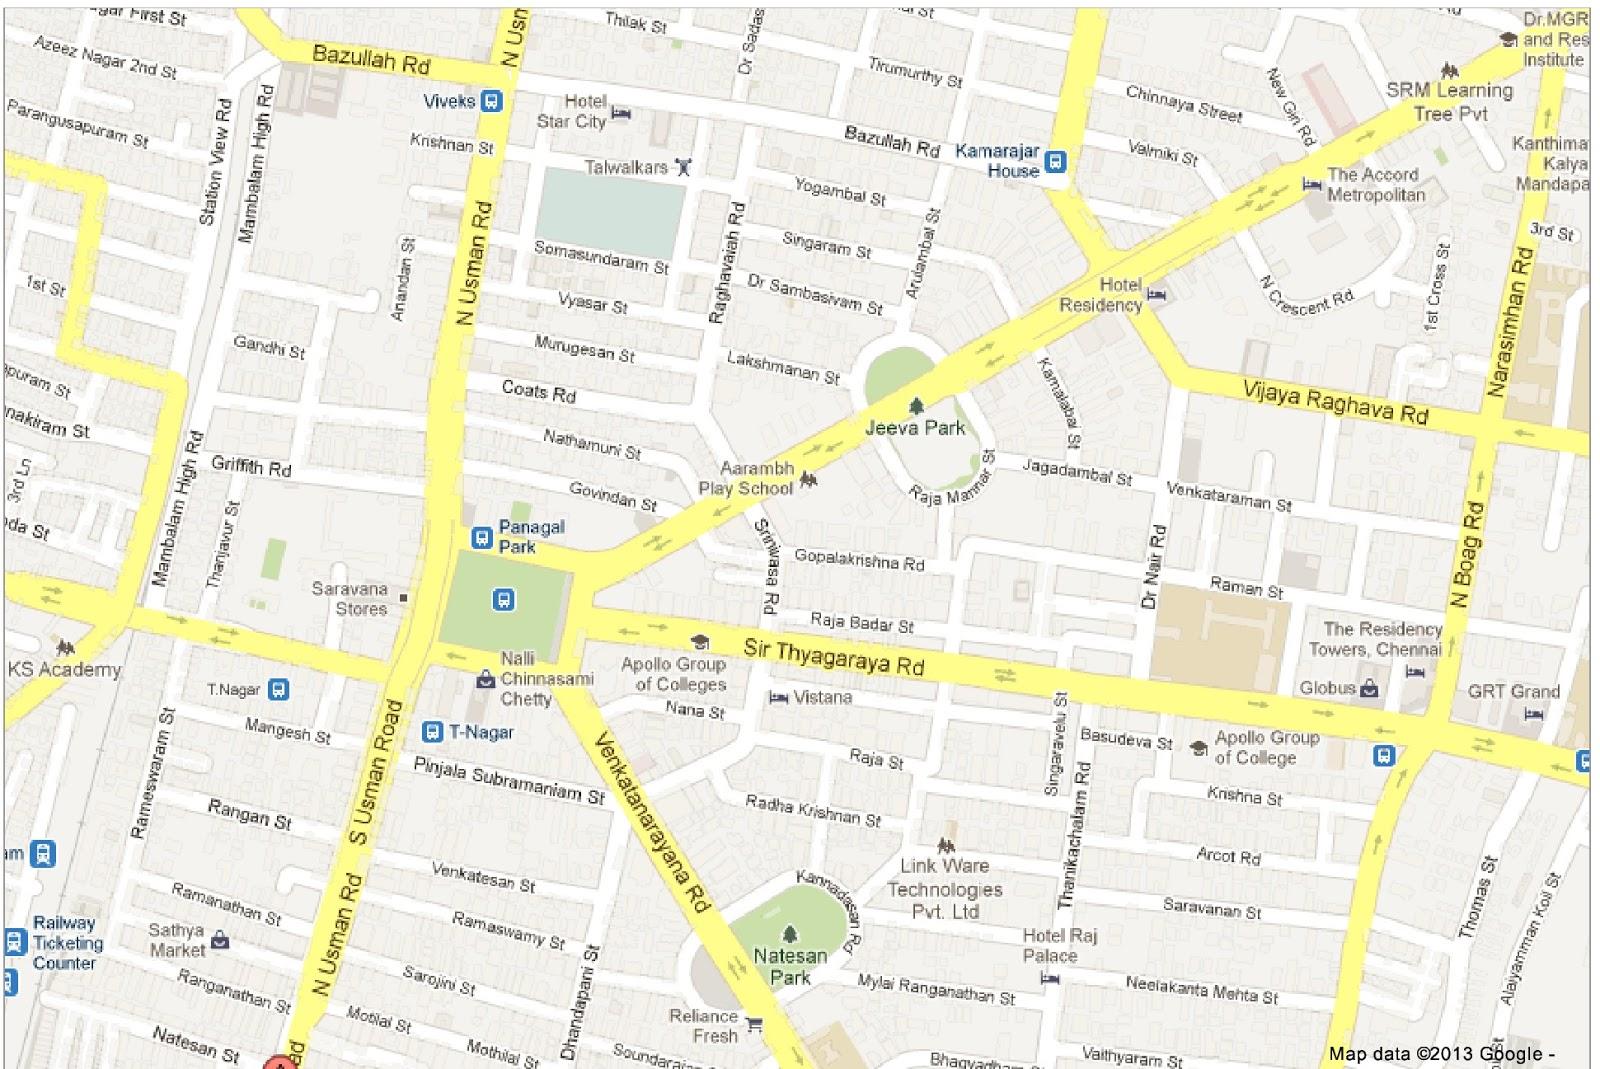 Usman Road T Nagar Name Reason Namma Area